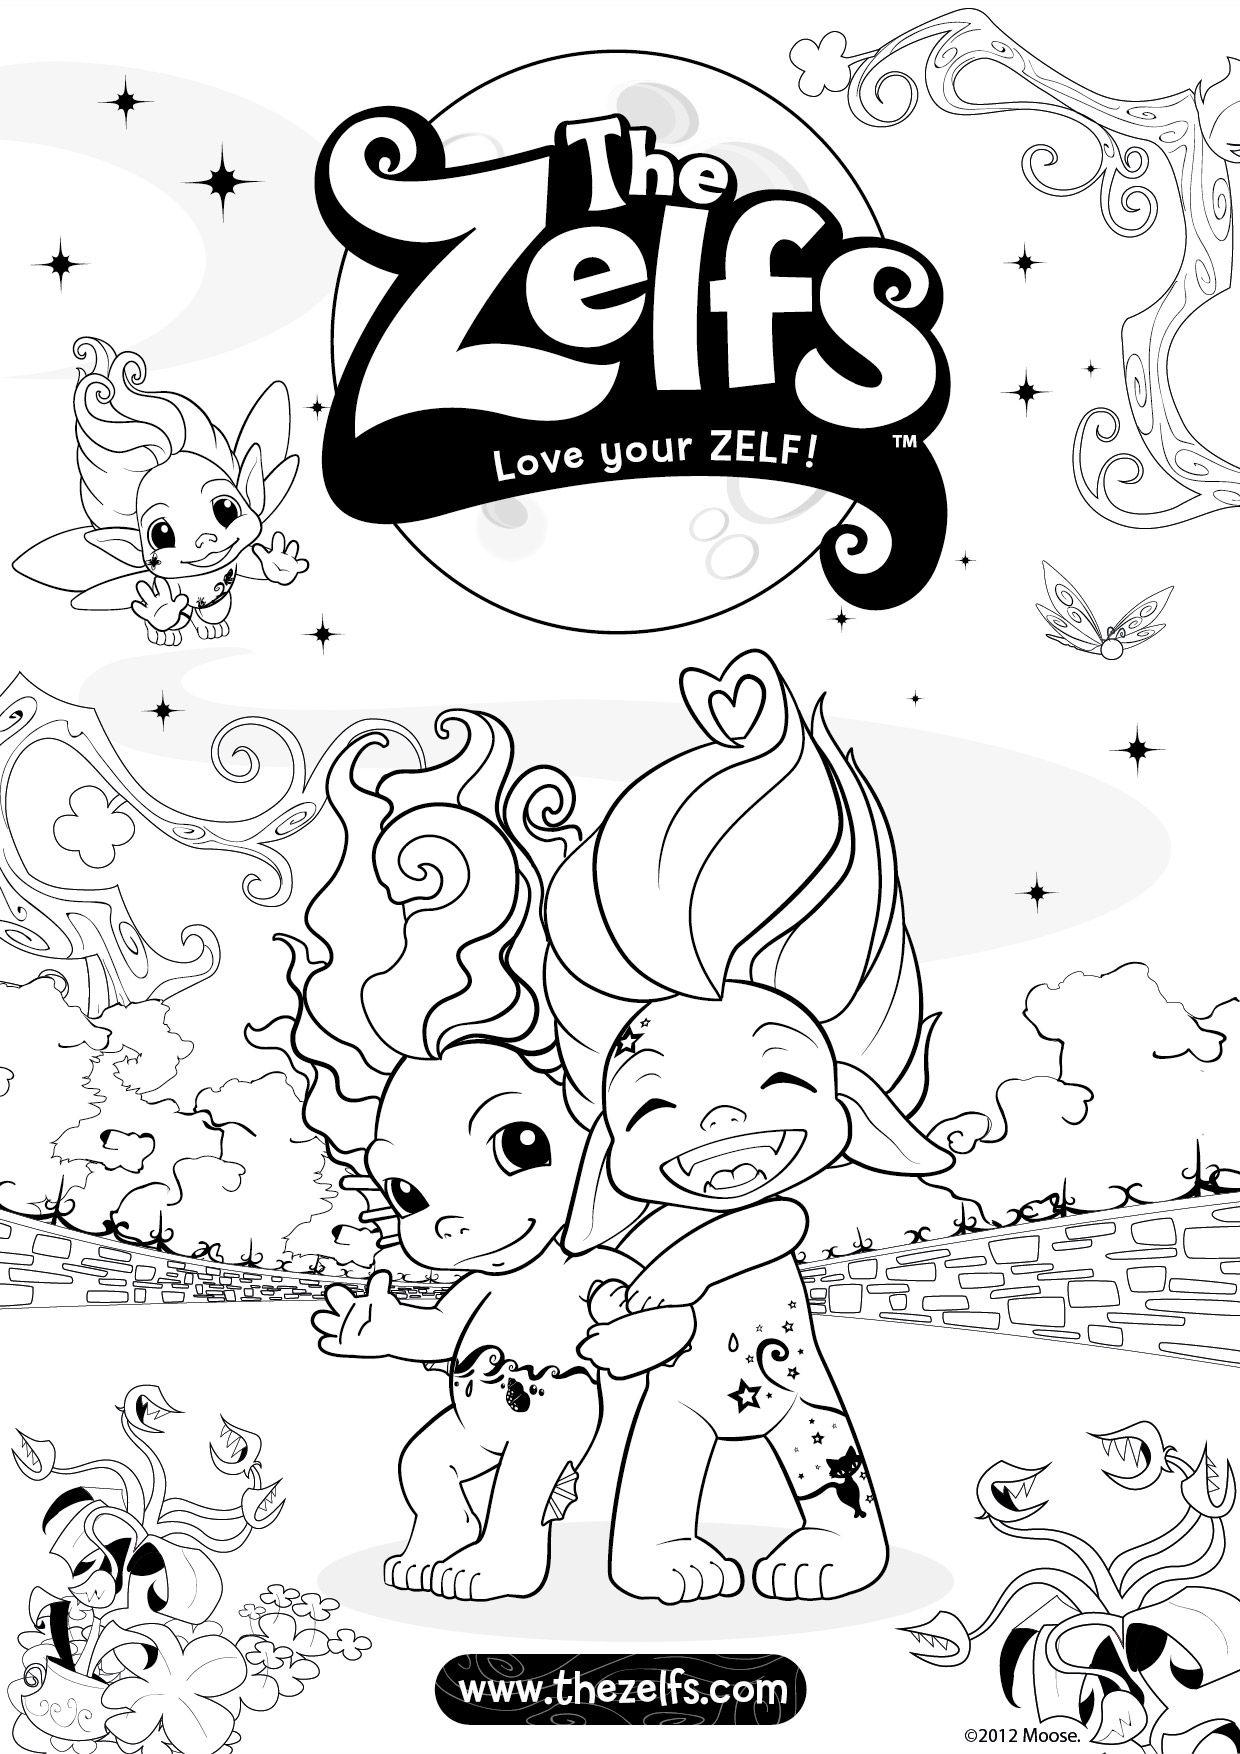 zelfs coloring pages | Zelfs coloring page | Zelfs | Coloring books, Coloring ...